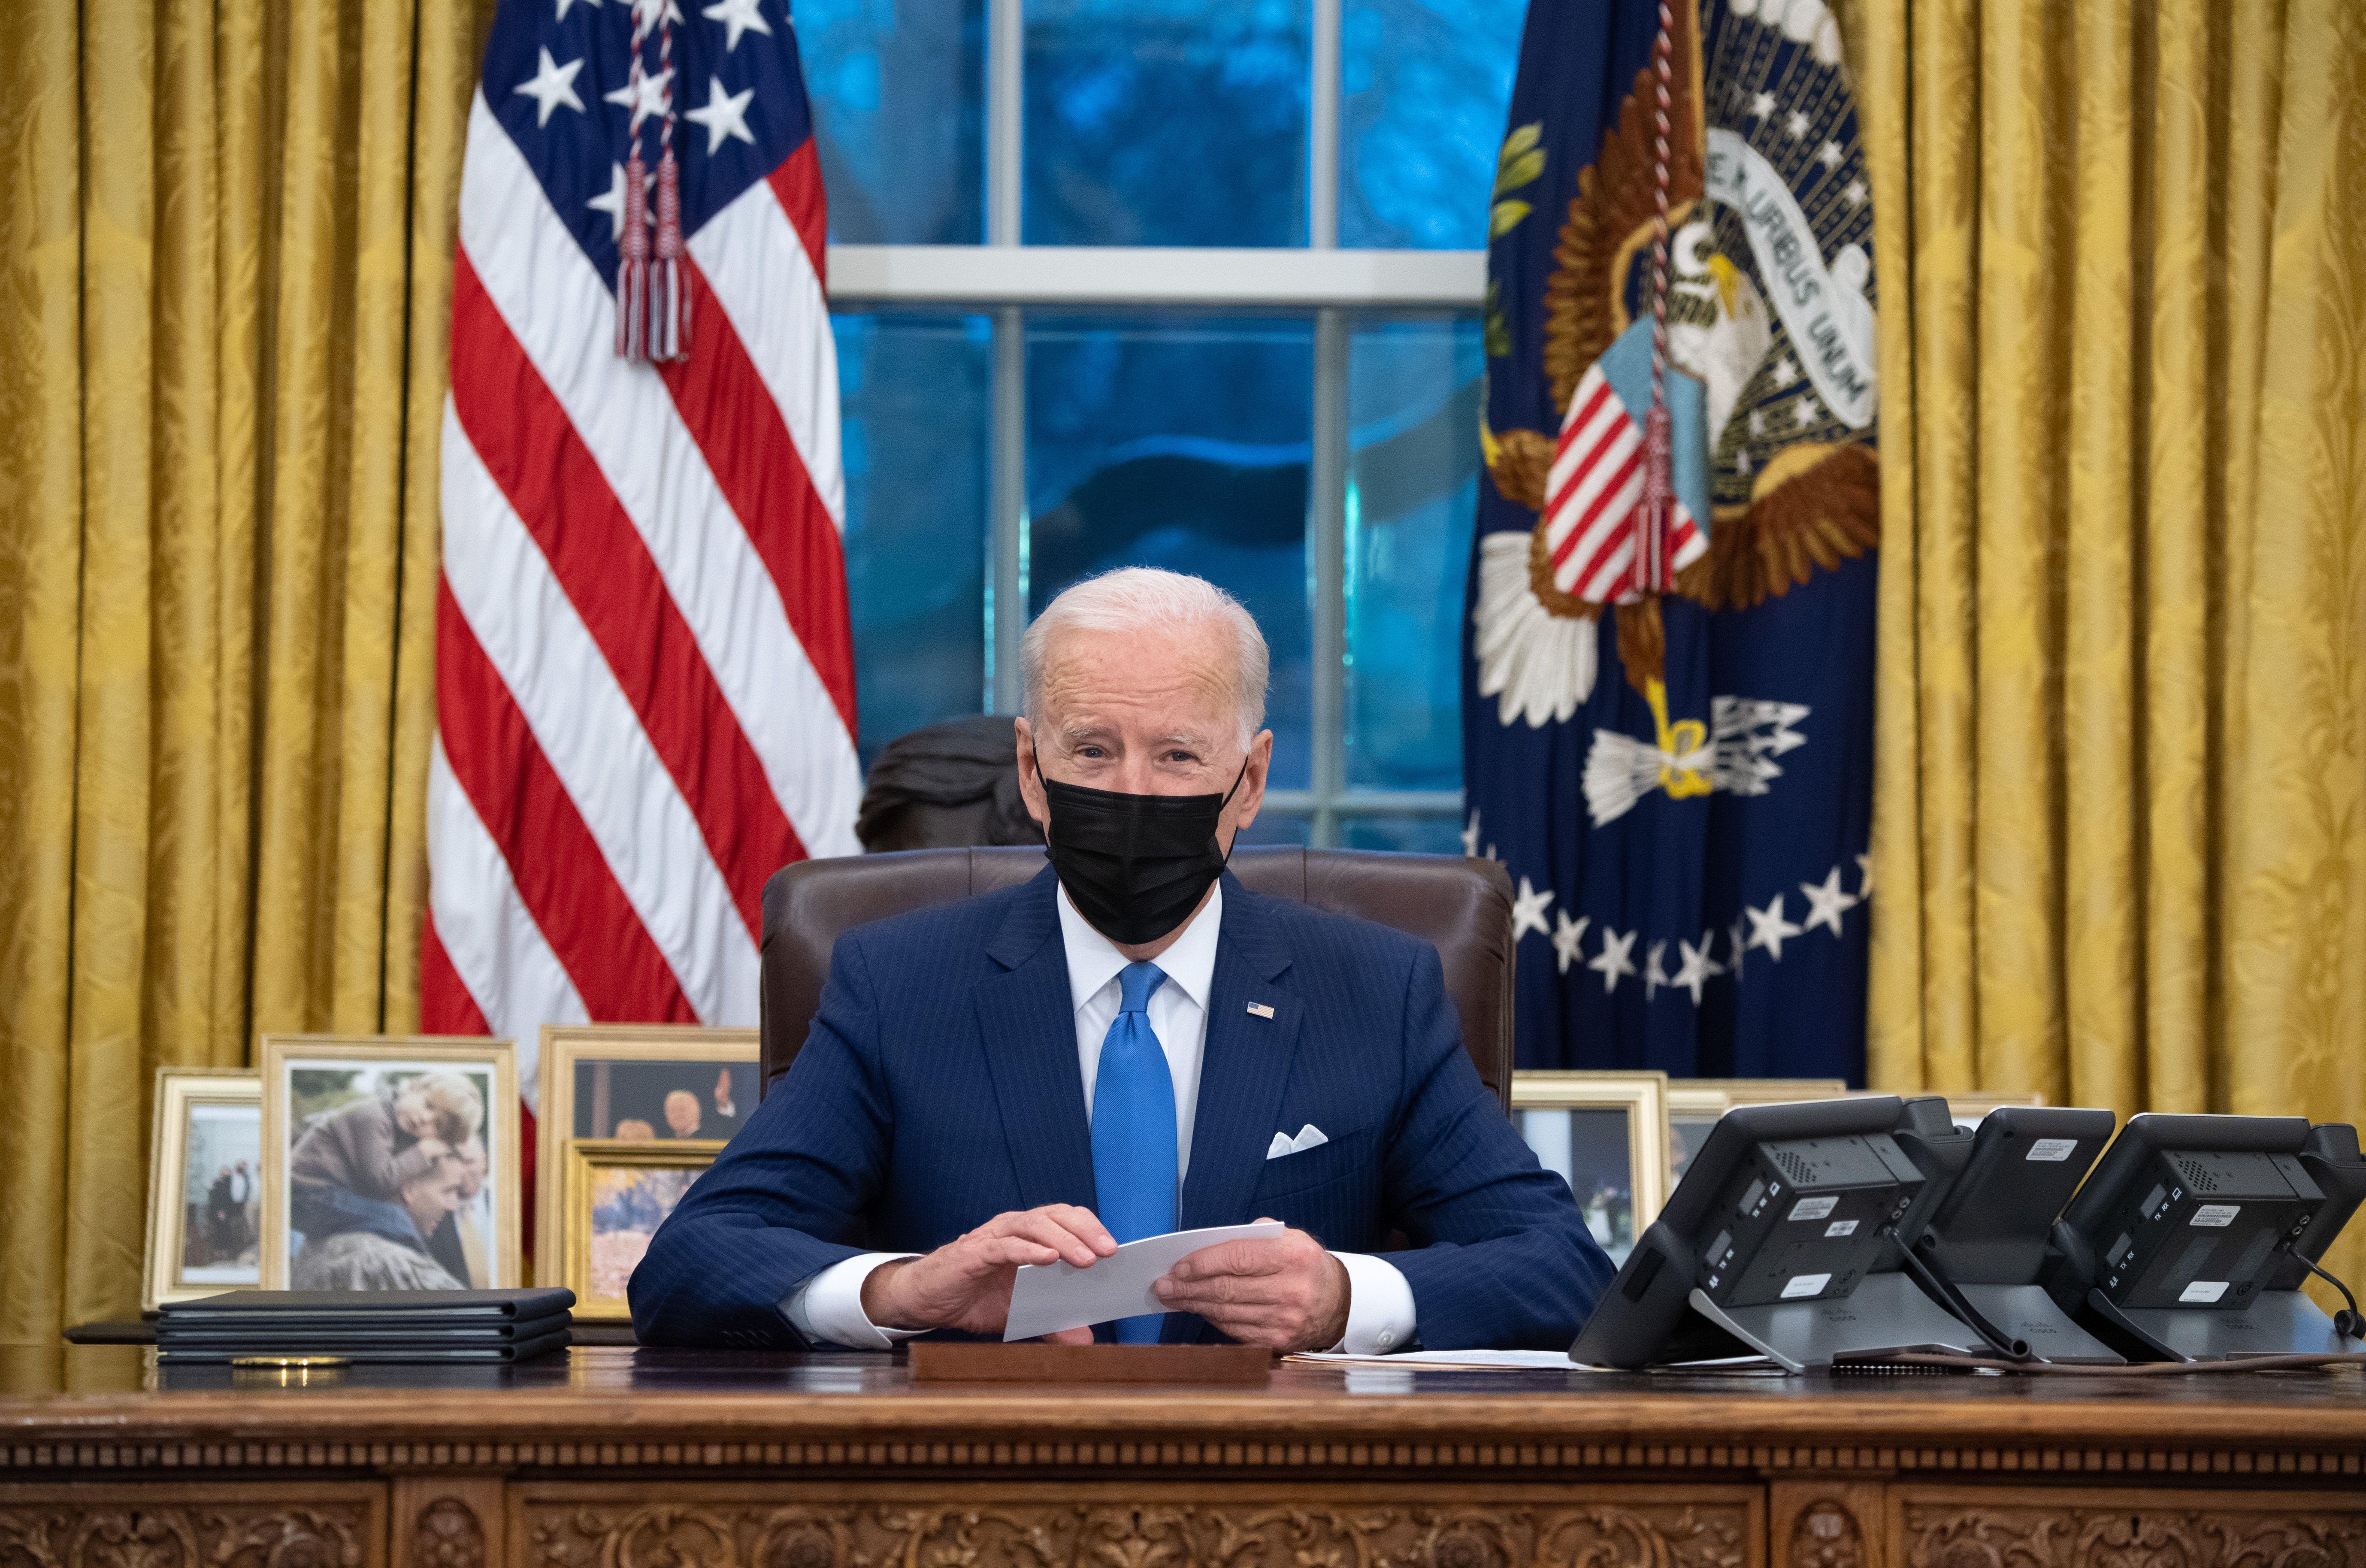 Deseoso de construir infraestructura, Biden planea gravar las empresas